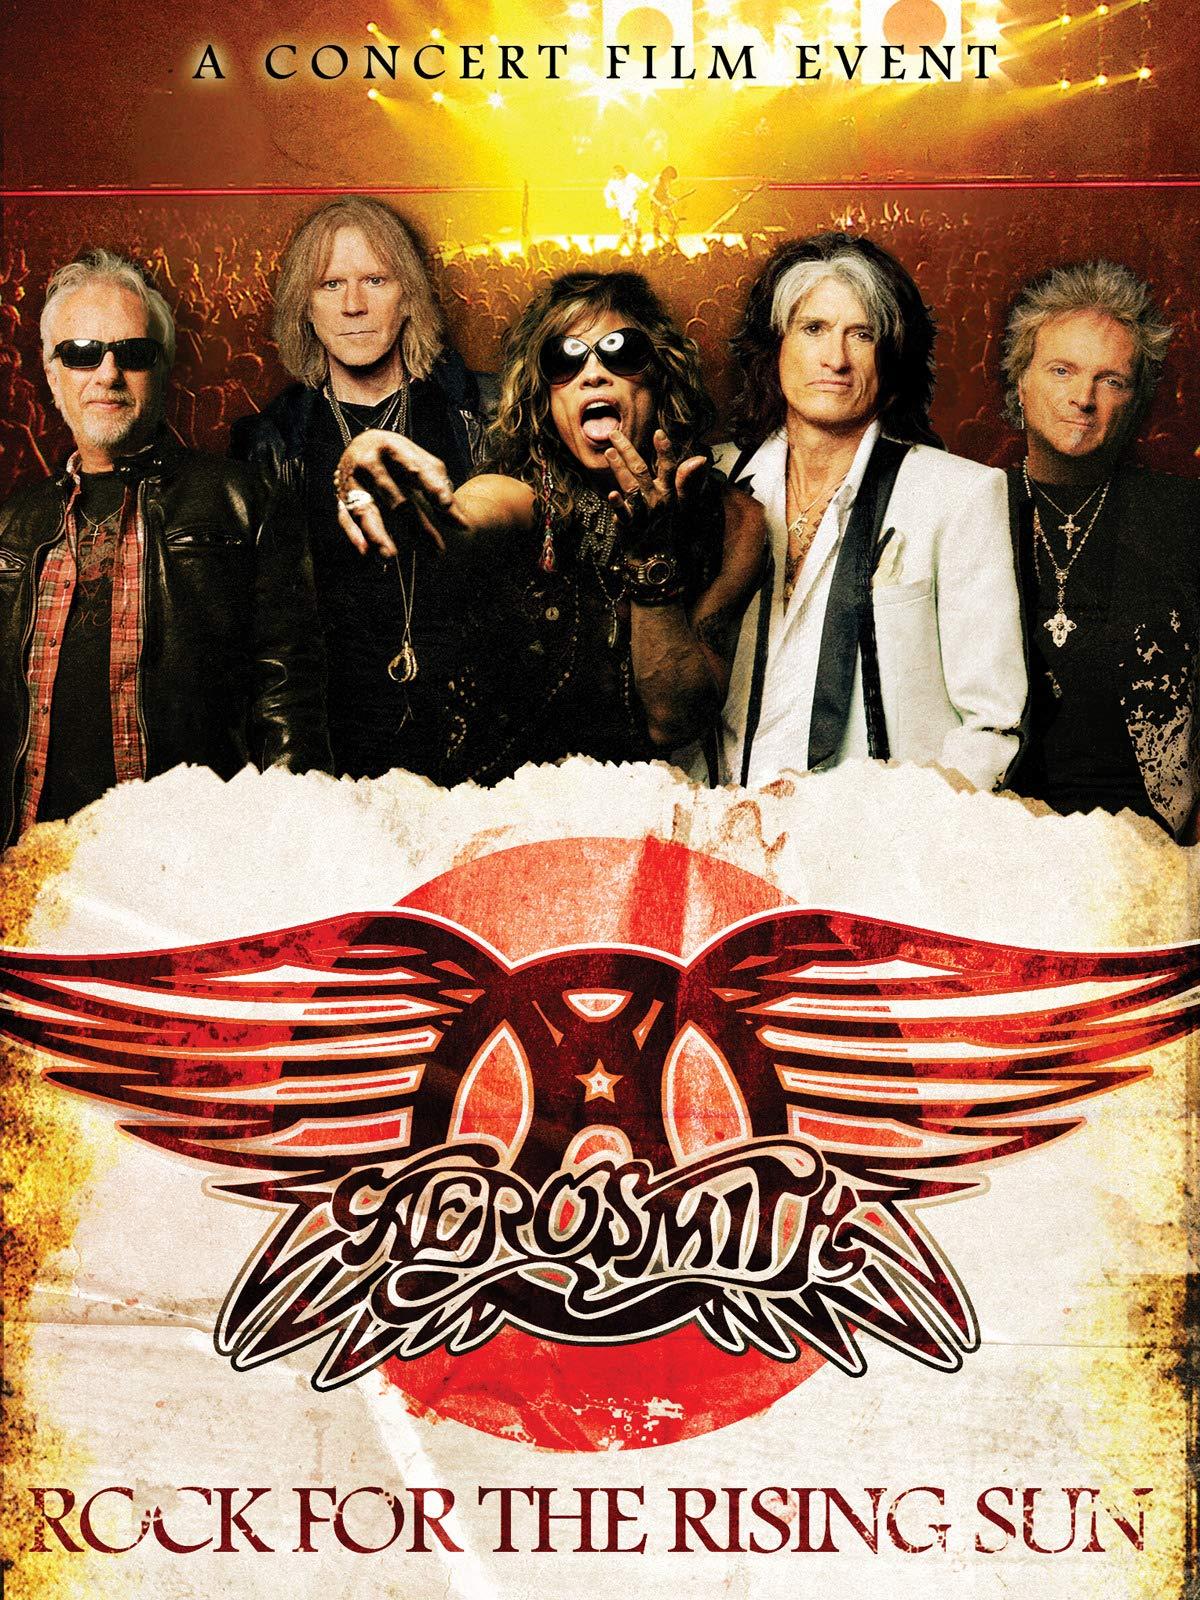 Aerosmith Rock For The Rising Sun